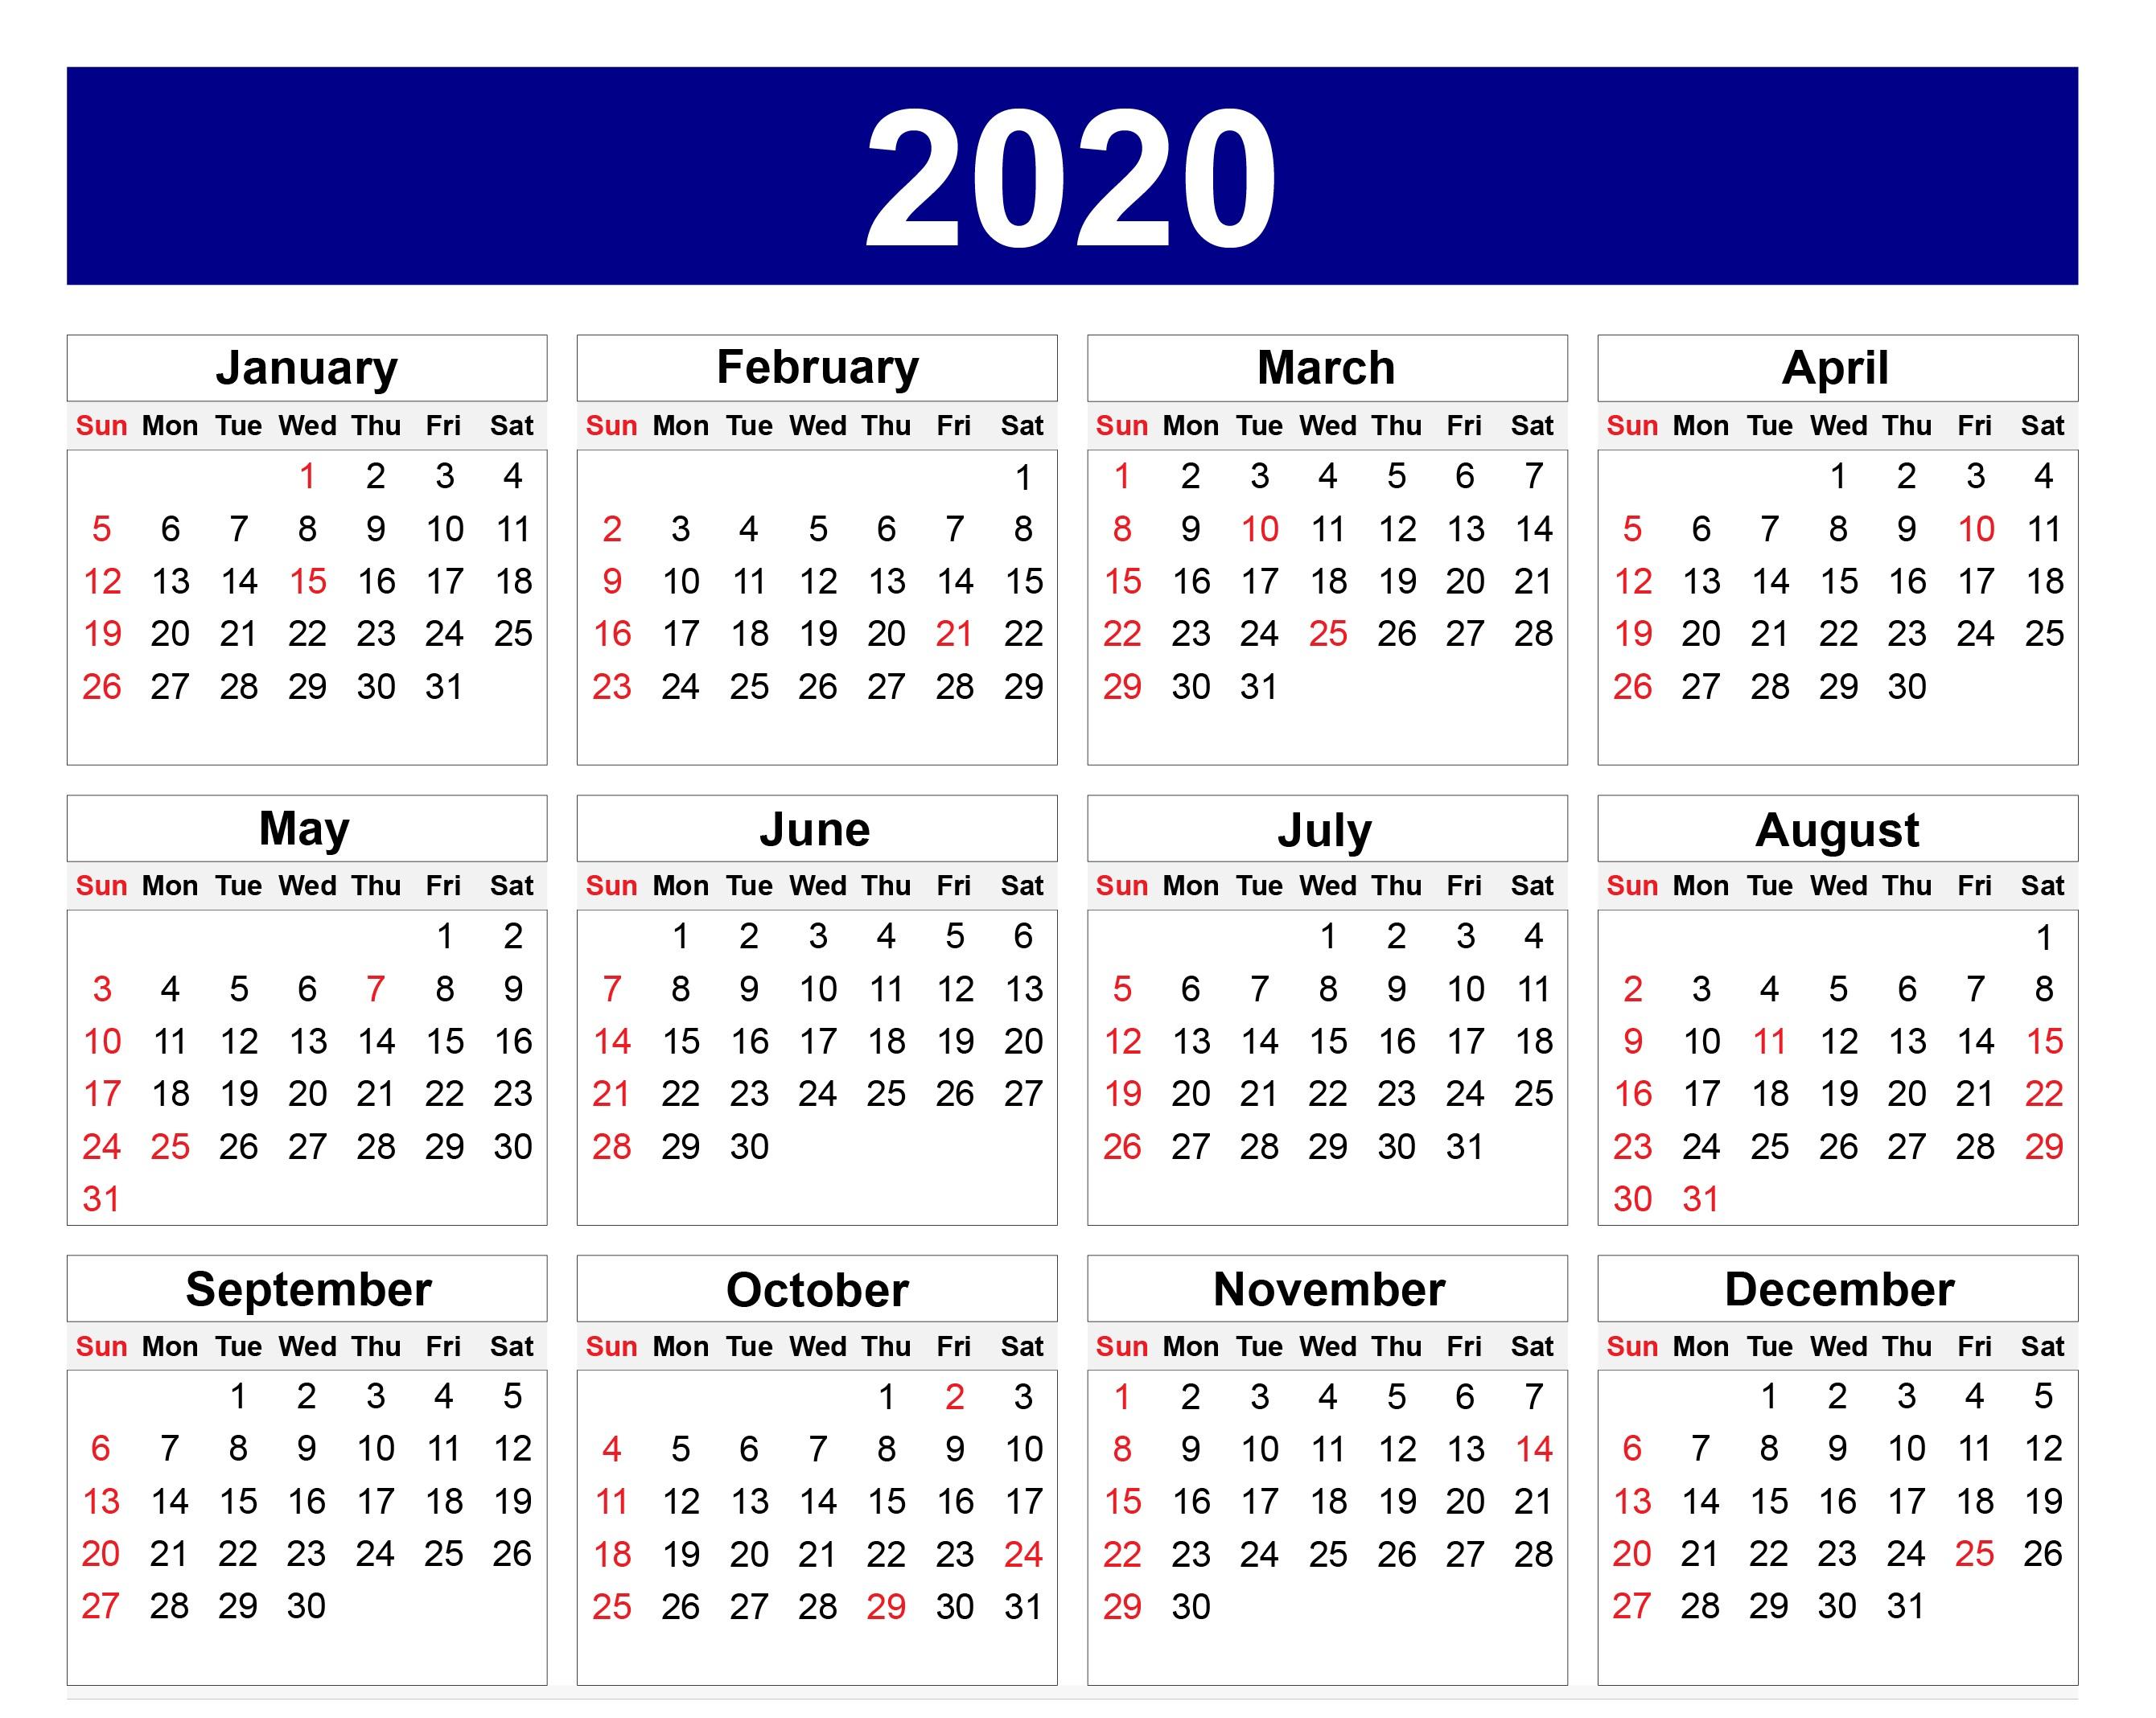 Calendar For 2020 Australia